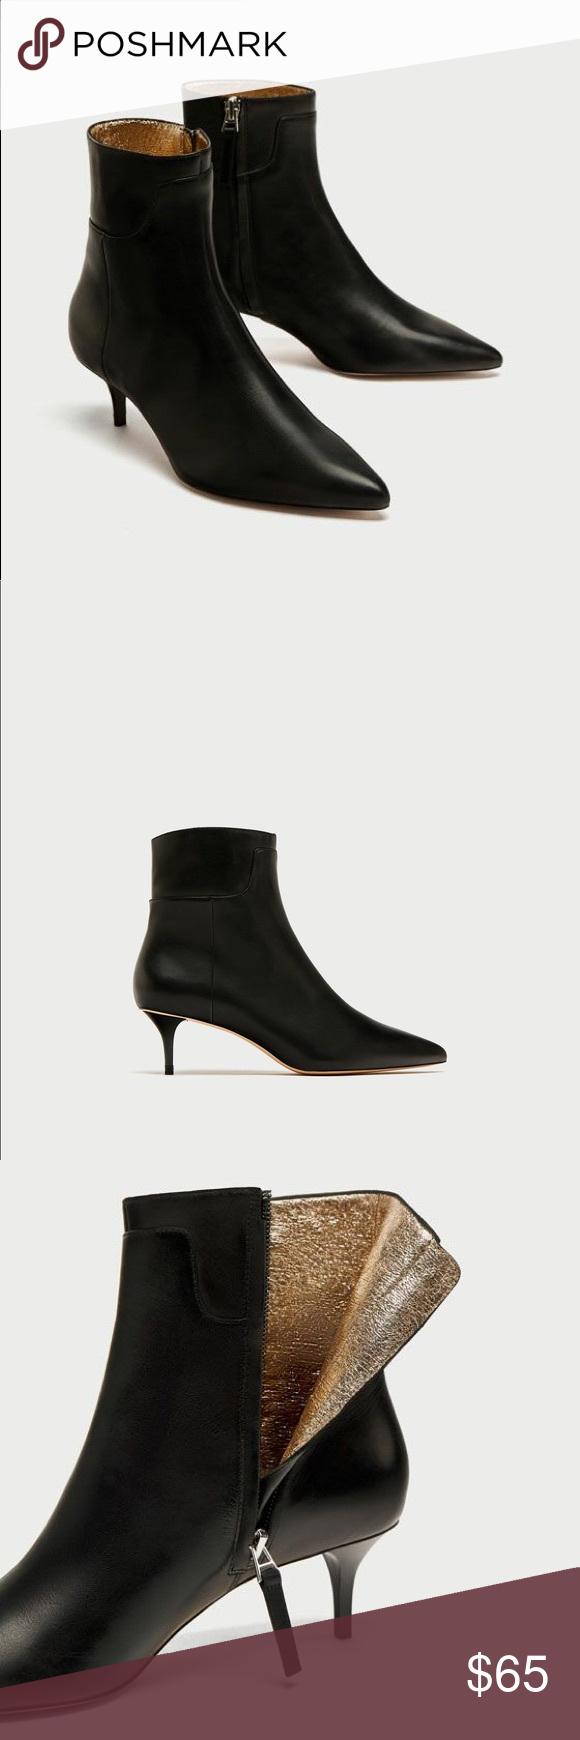 Nwt Zara Black Leather Kitten Heel Ankle Boots Kitten Heel Ankle Boots Zara Black Boots